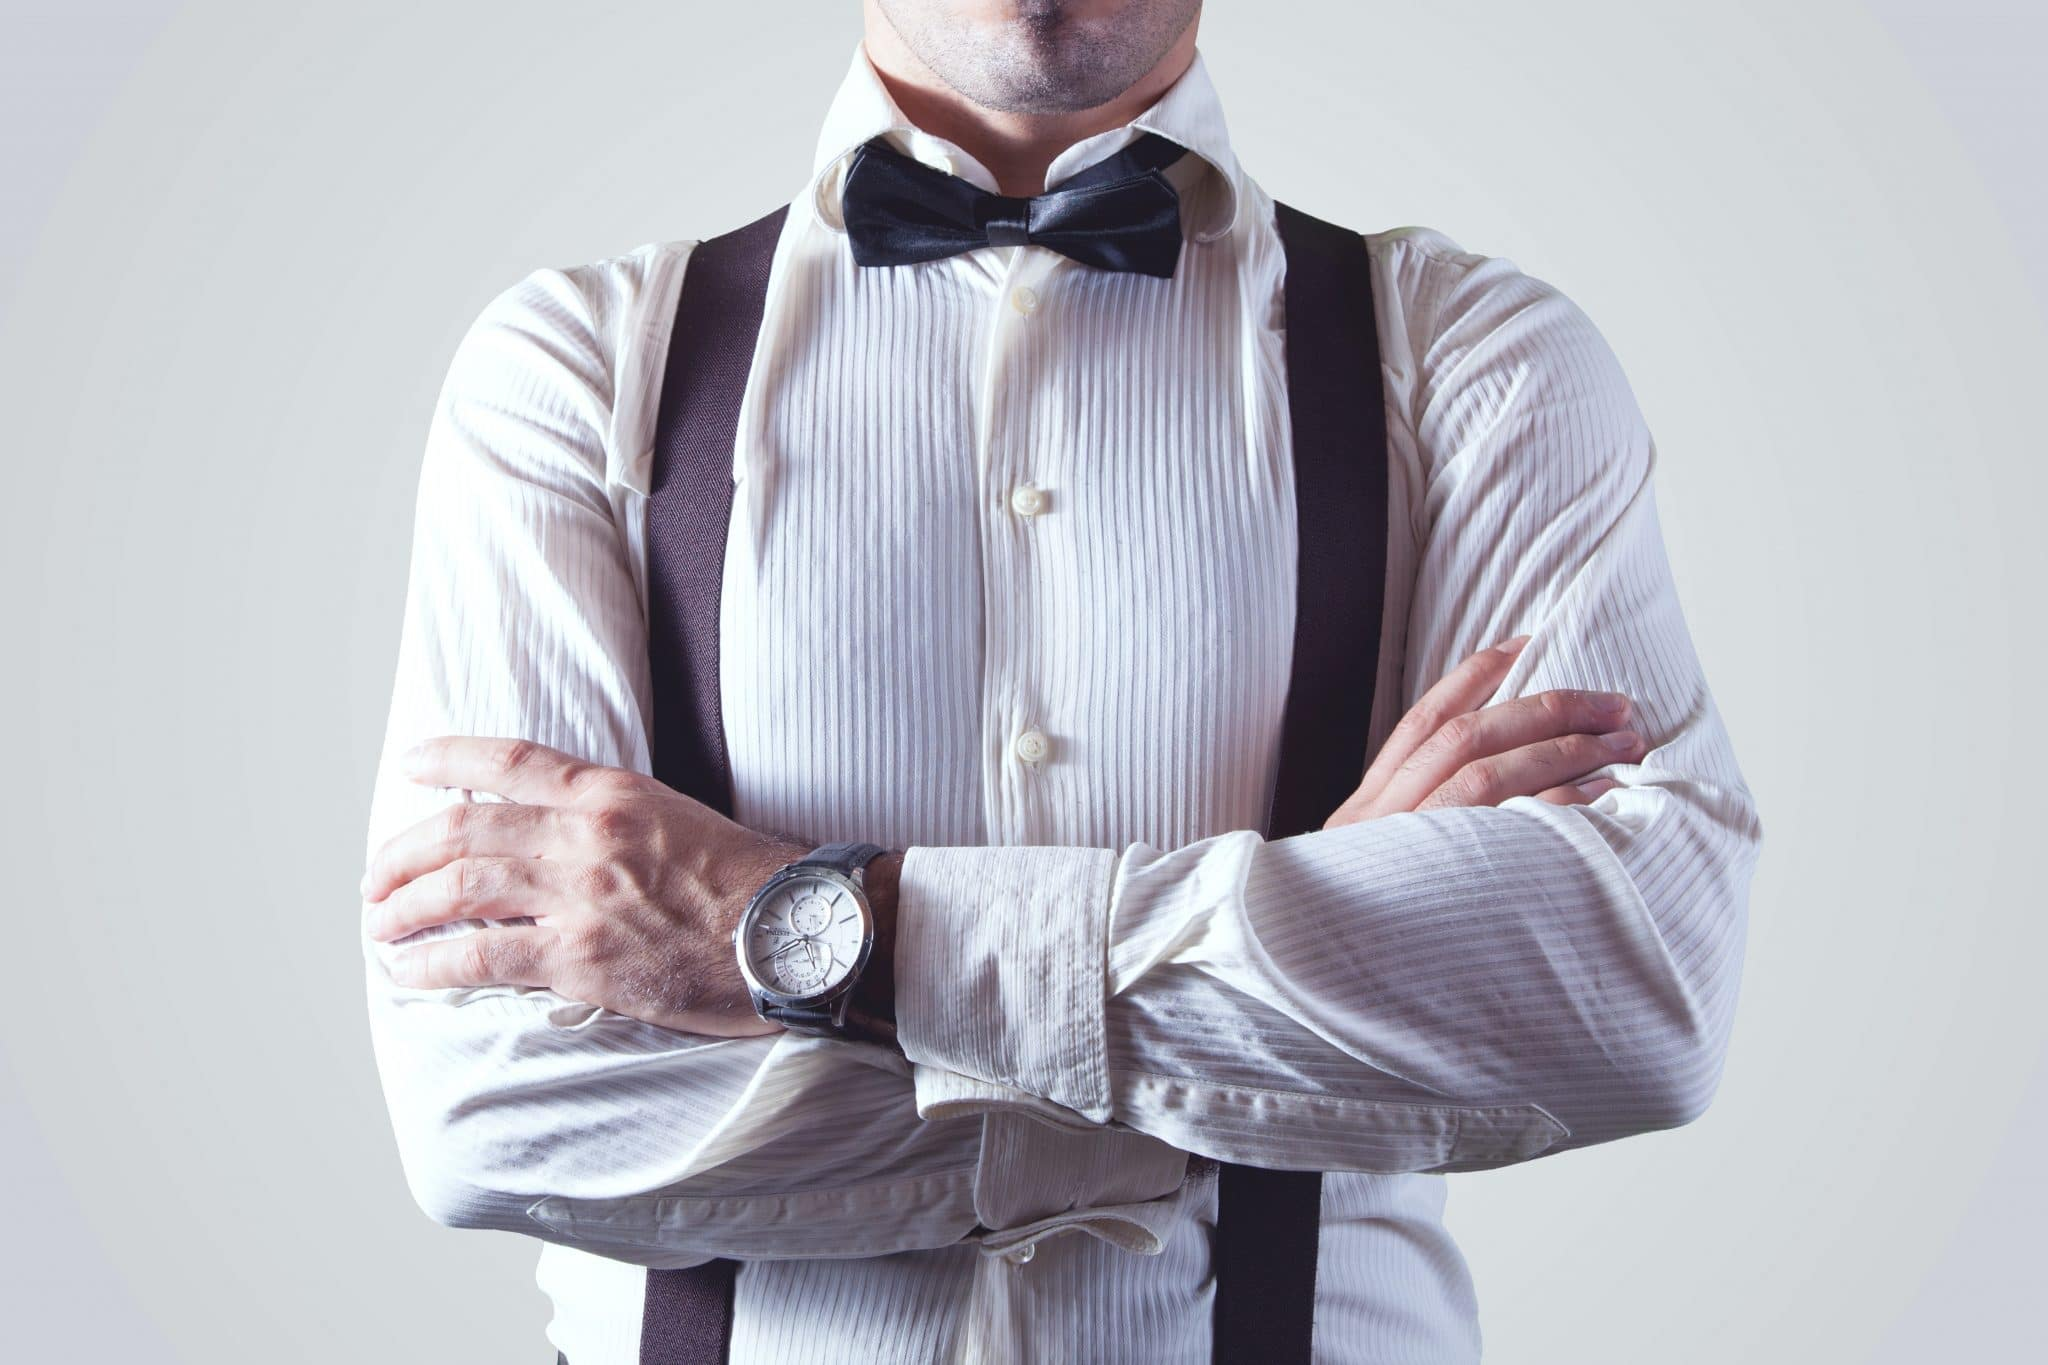 Où acheter vos bretelles ?